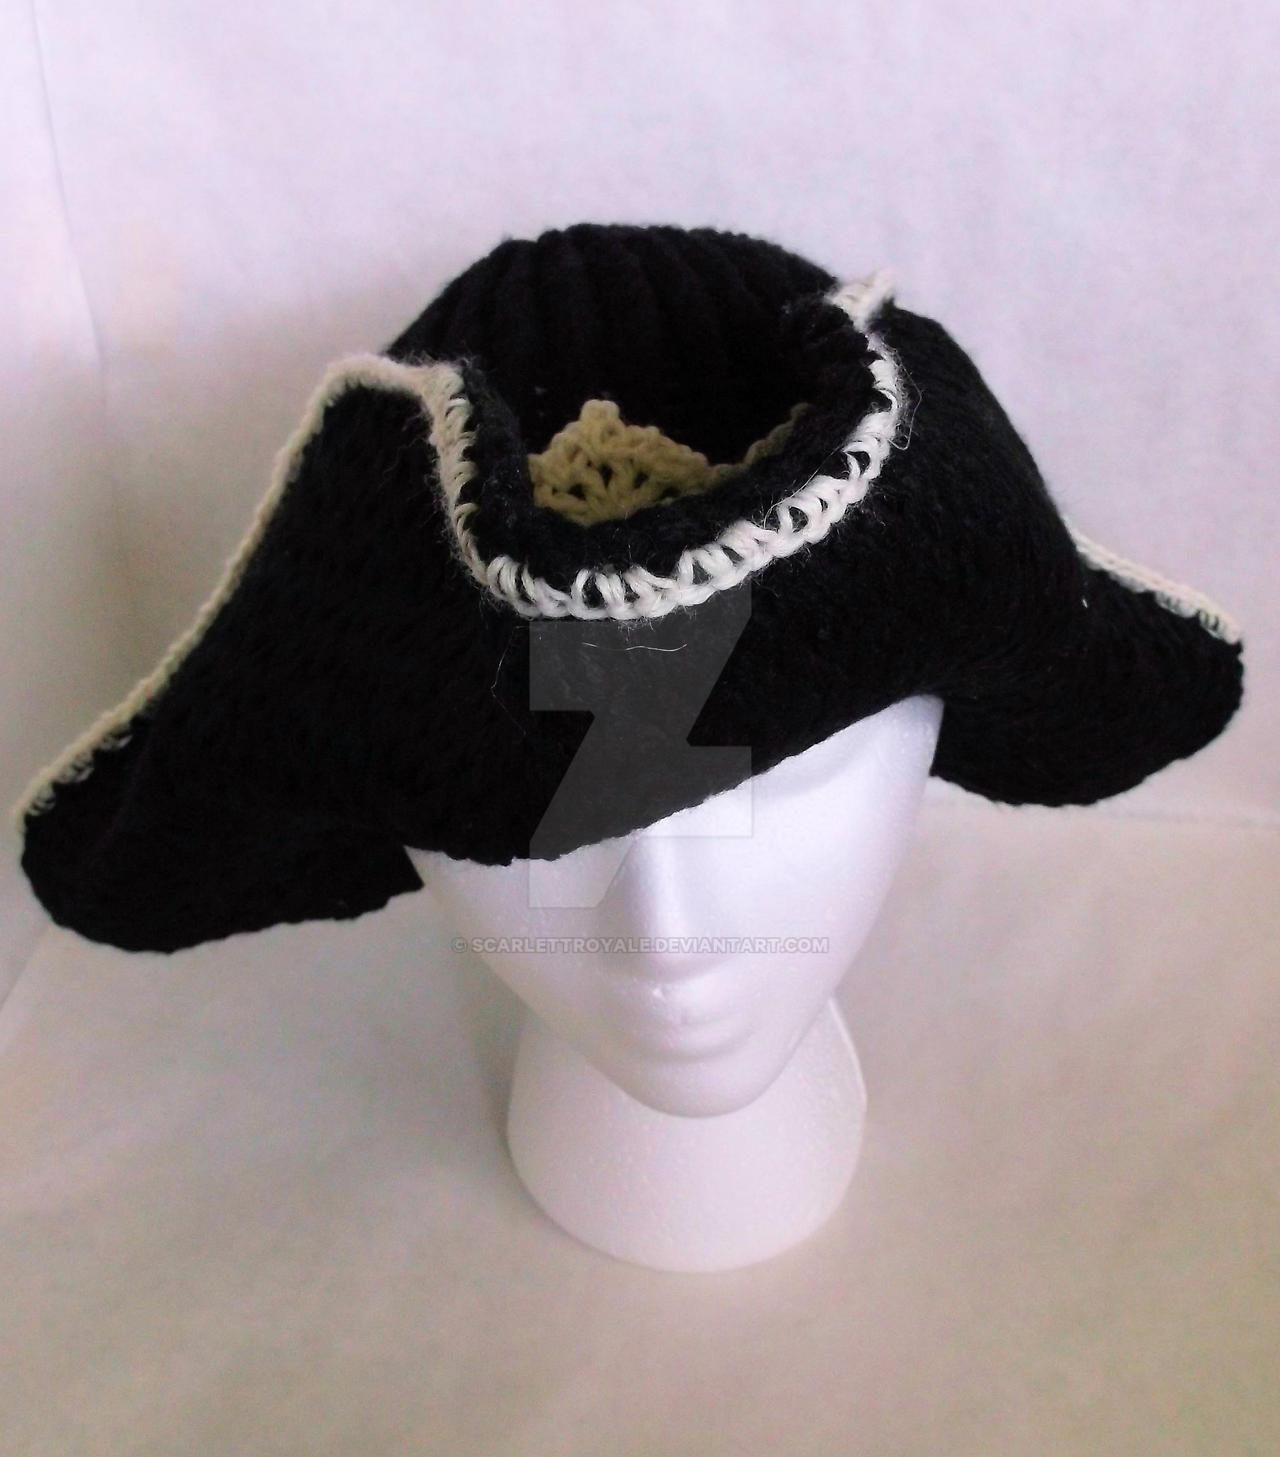 Loom Knit Pirate Hat by ScarlettRoyale